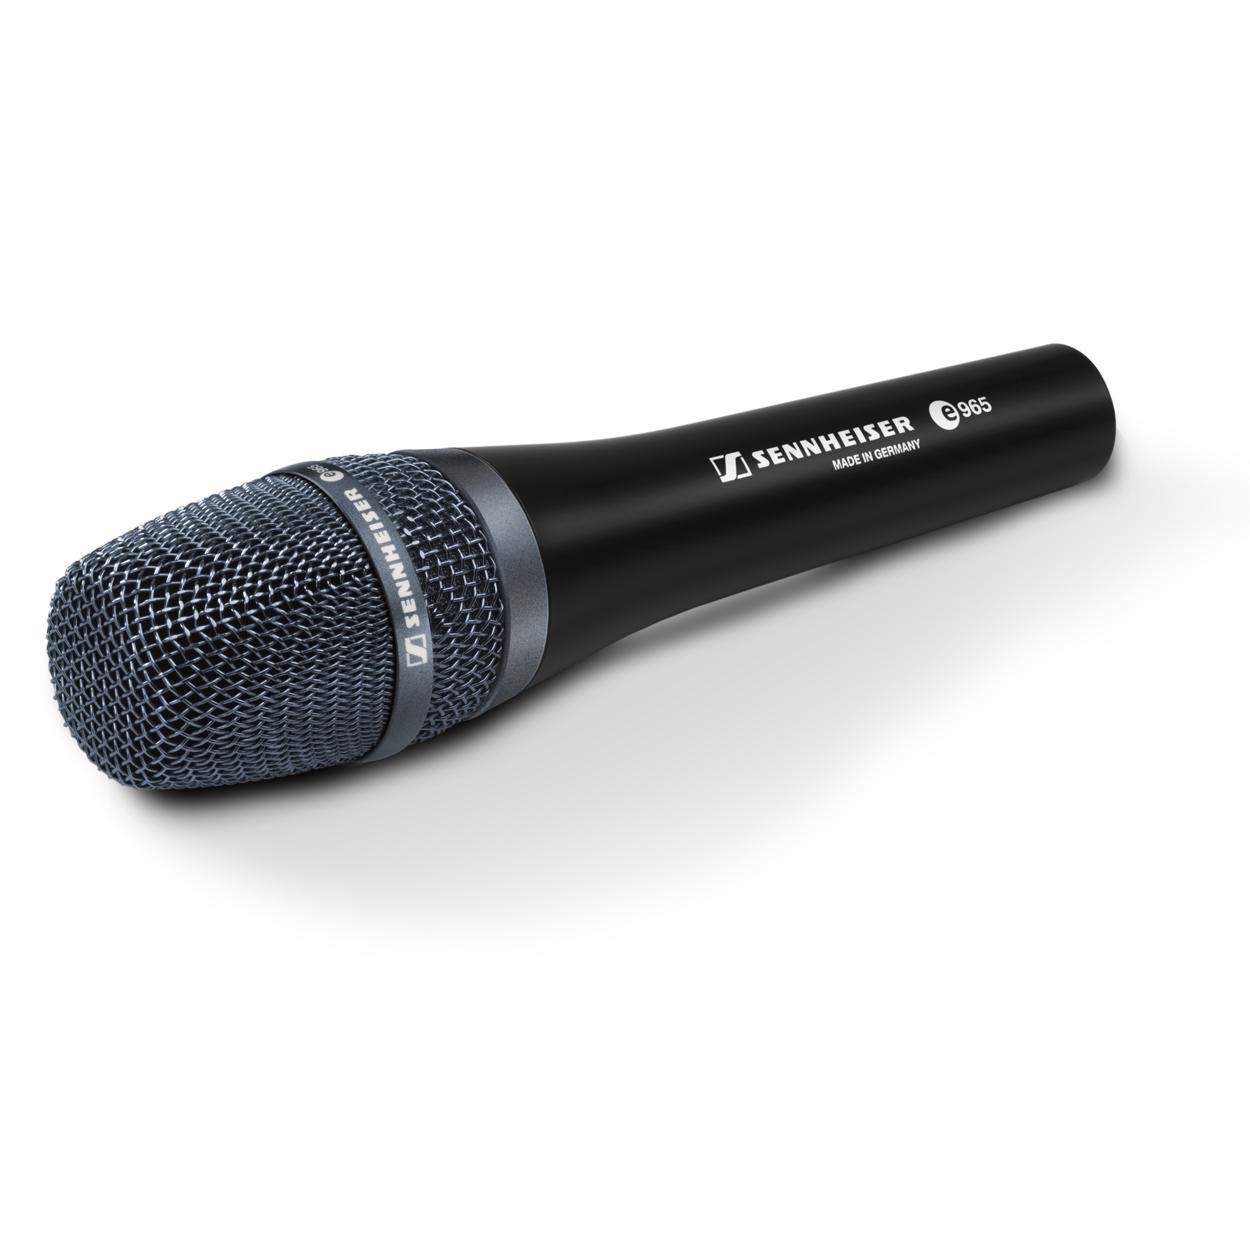 Afbeelding van Sennheiser E 965 zangmicrofoon condensator